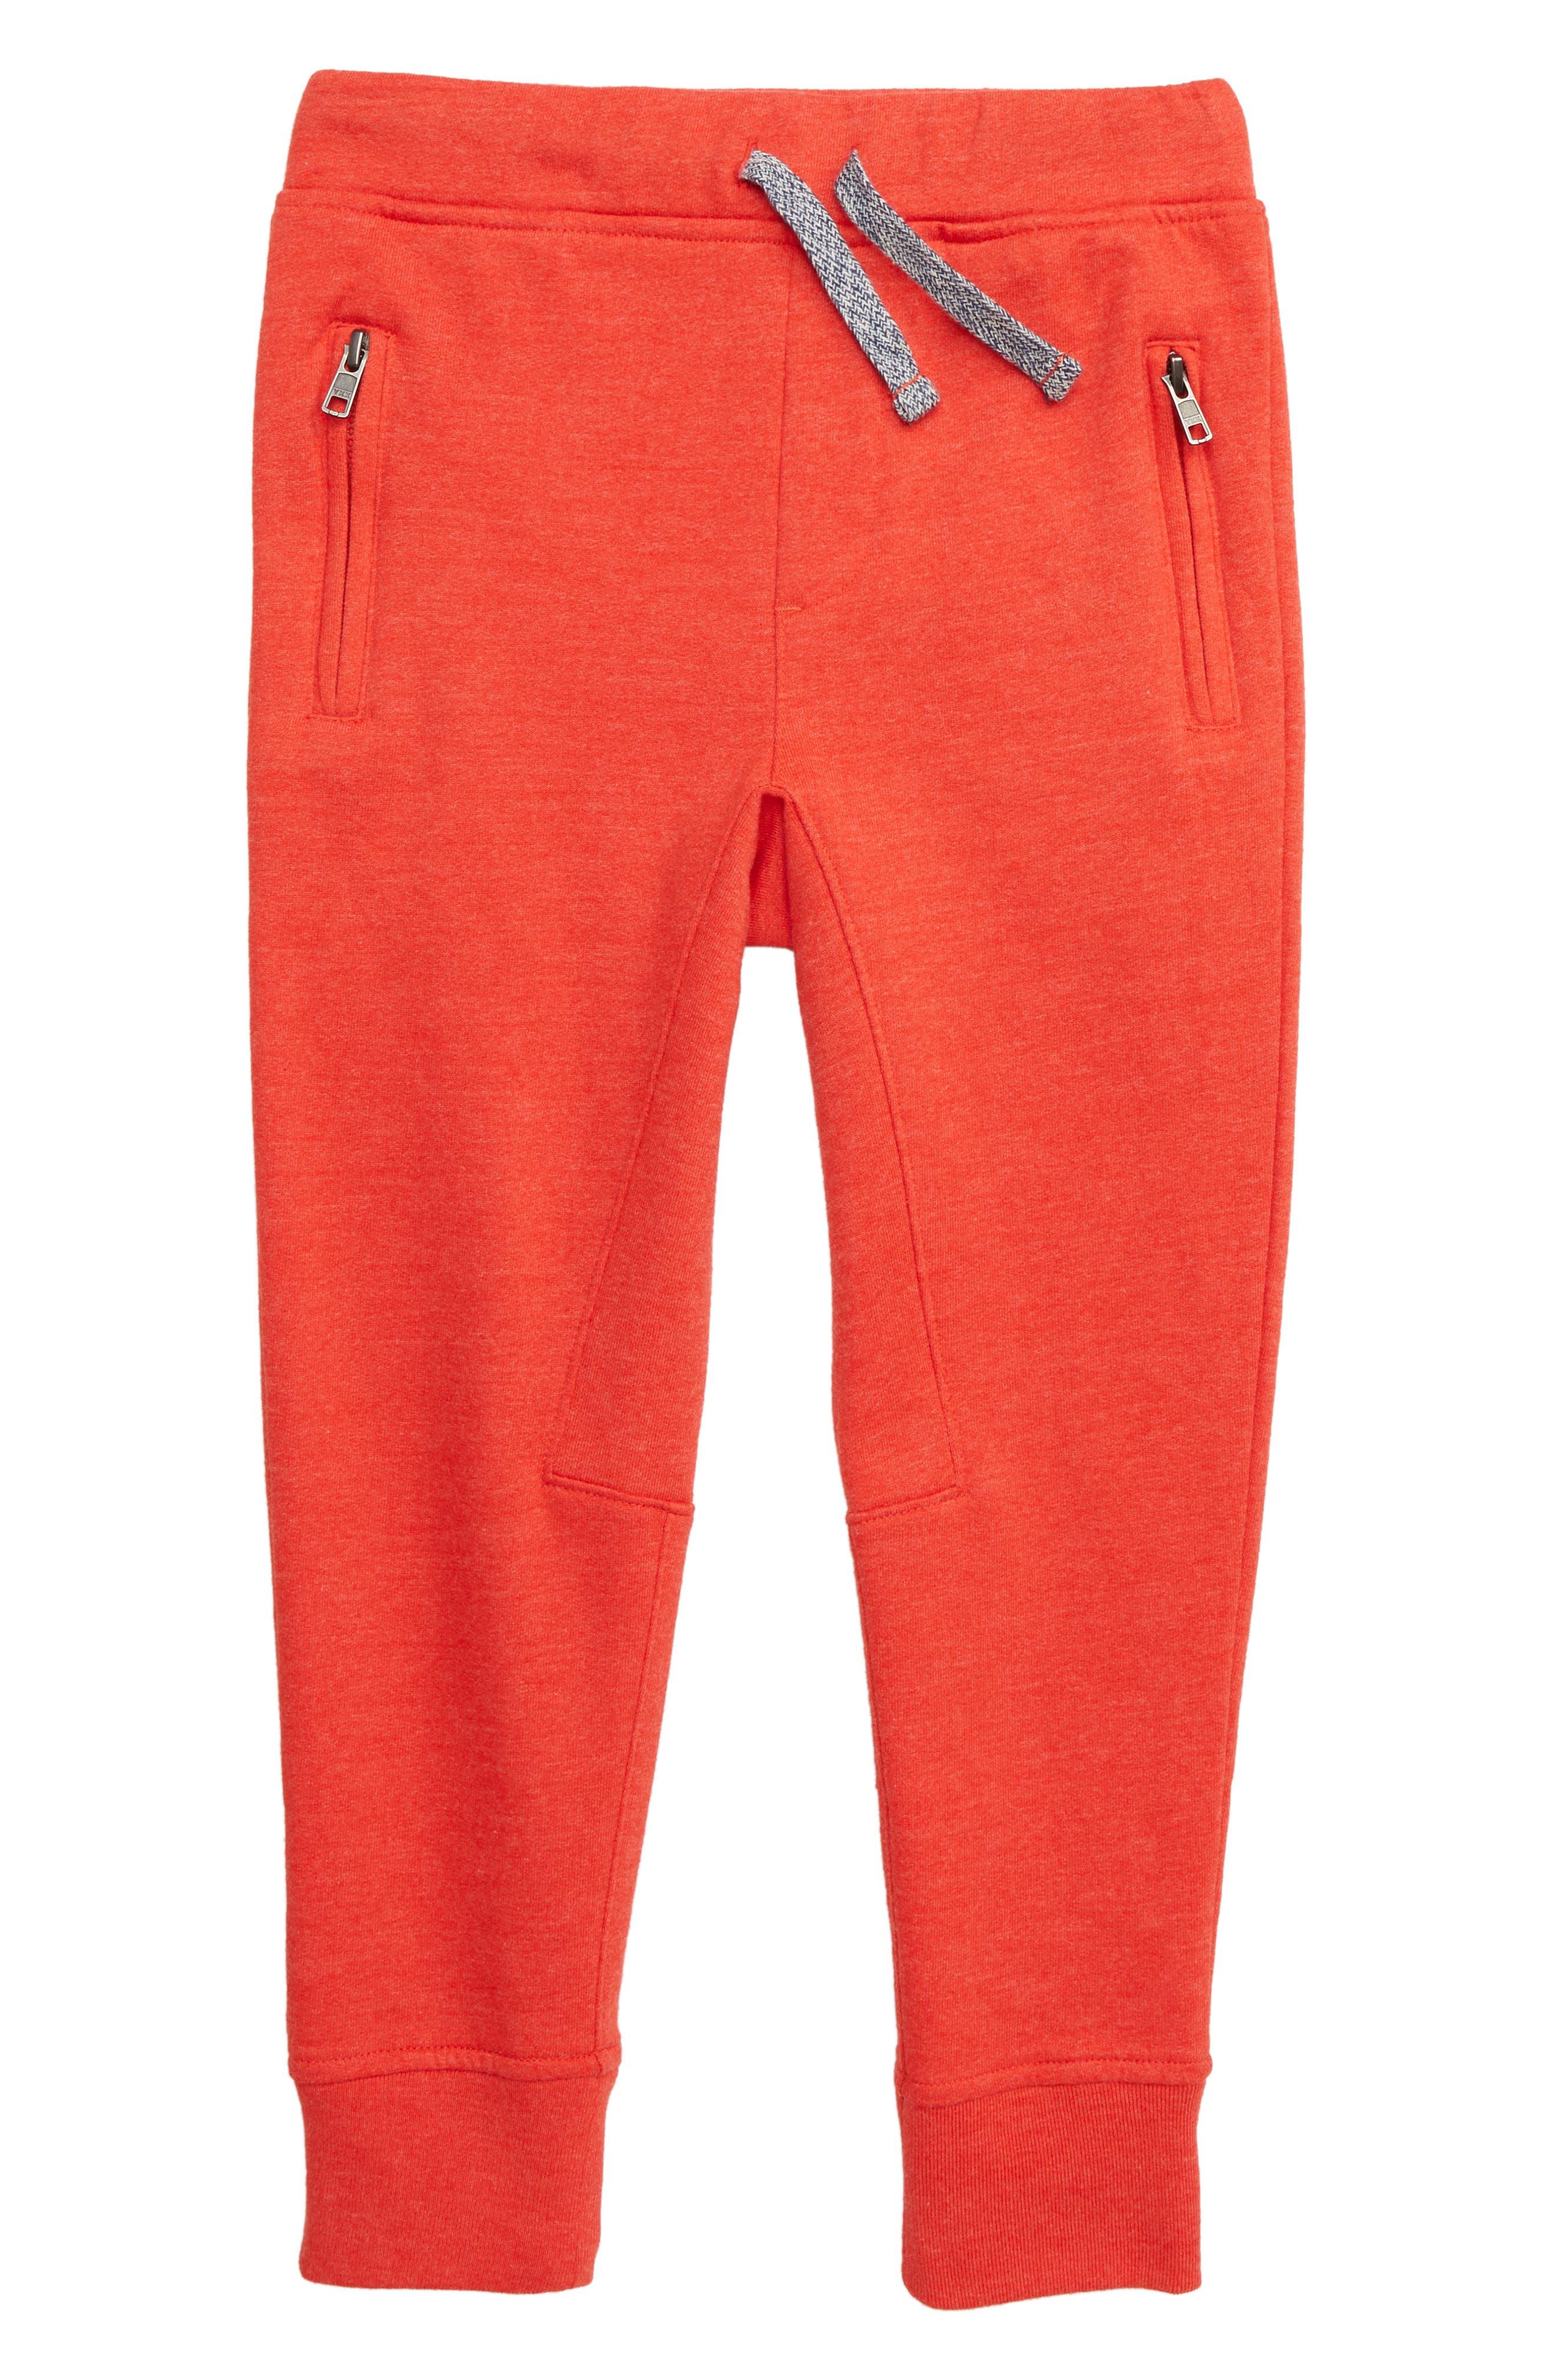 CREWCUTS BY J.CREW Slim Jogger Pants, Main, color, 600